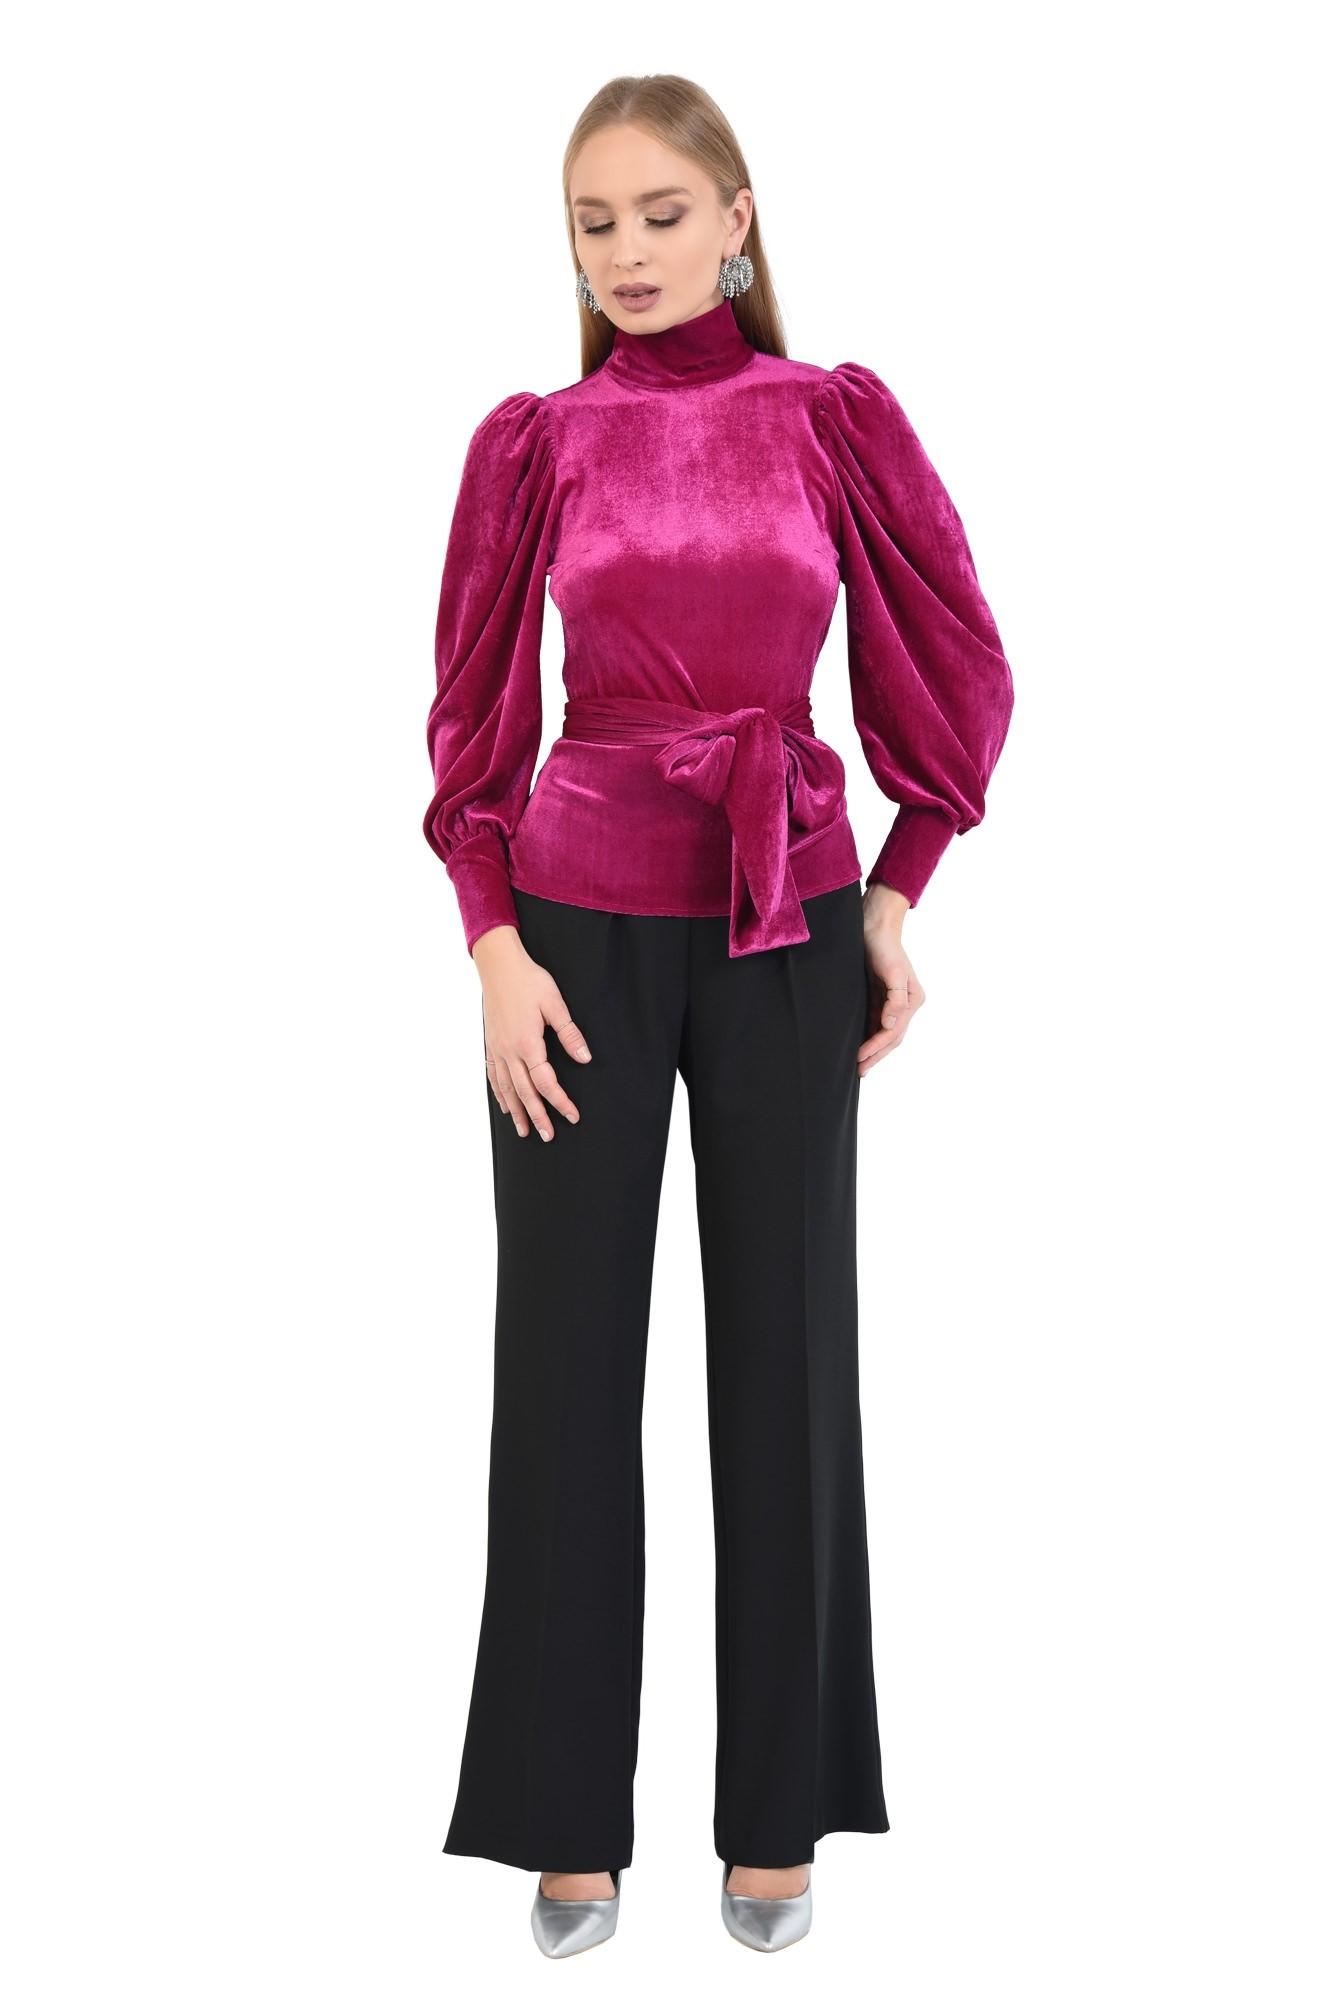 1 - 360 - bluza eleganta, roz ciclam, maneci bufante, funda la talie